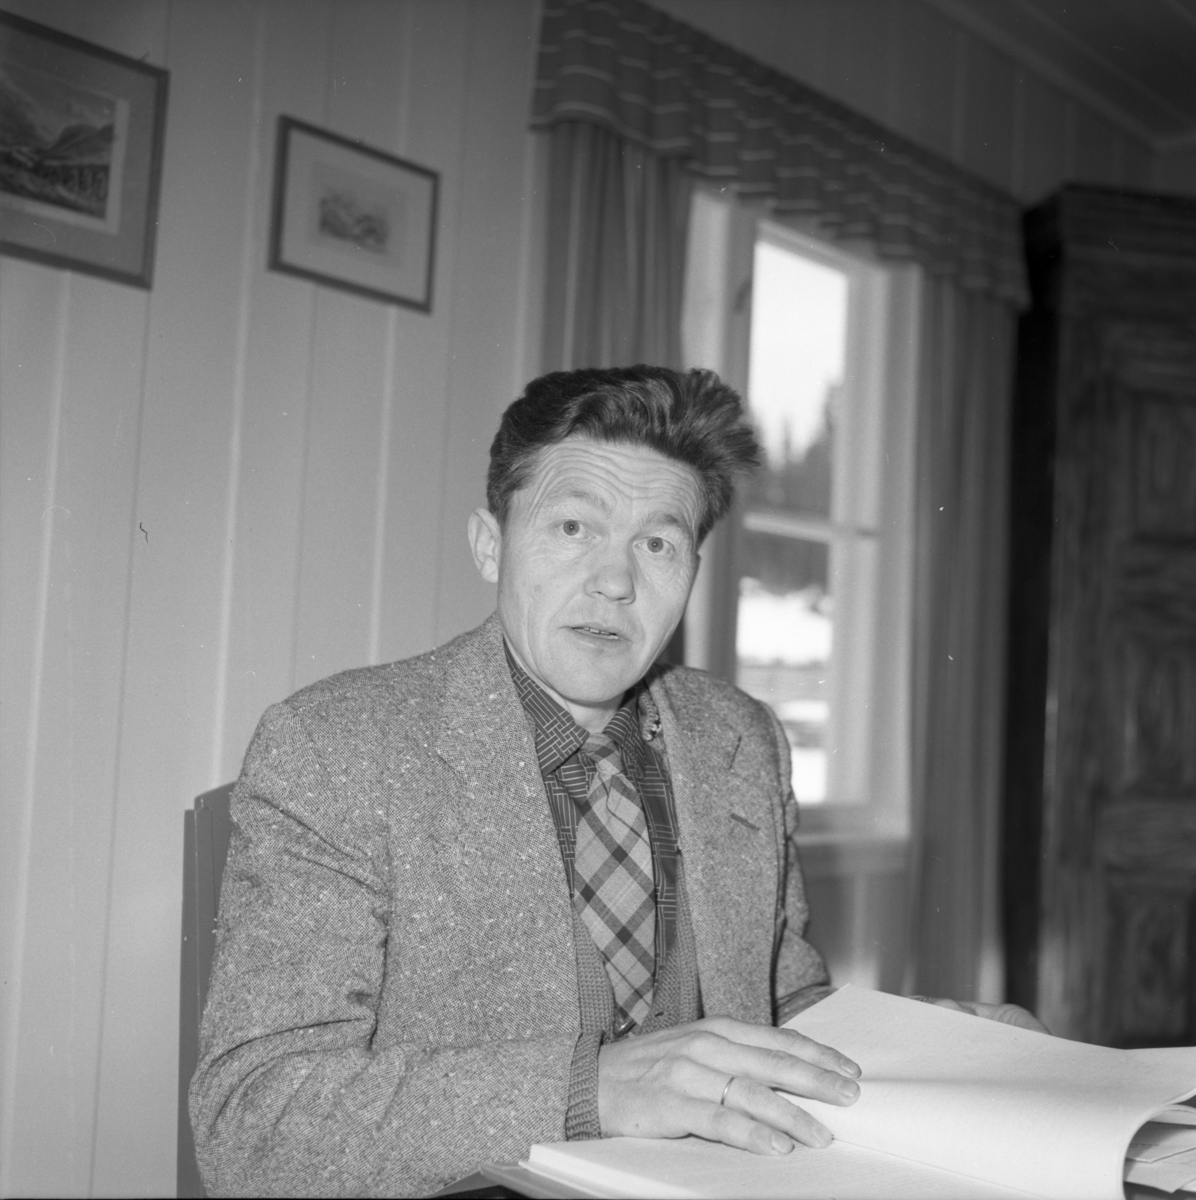 Lars Modahl